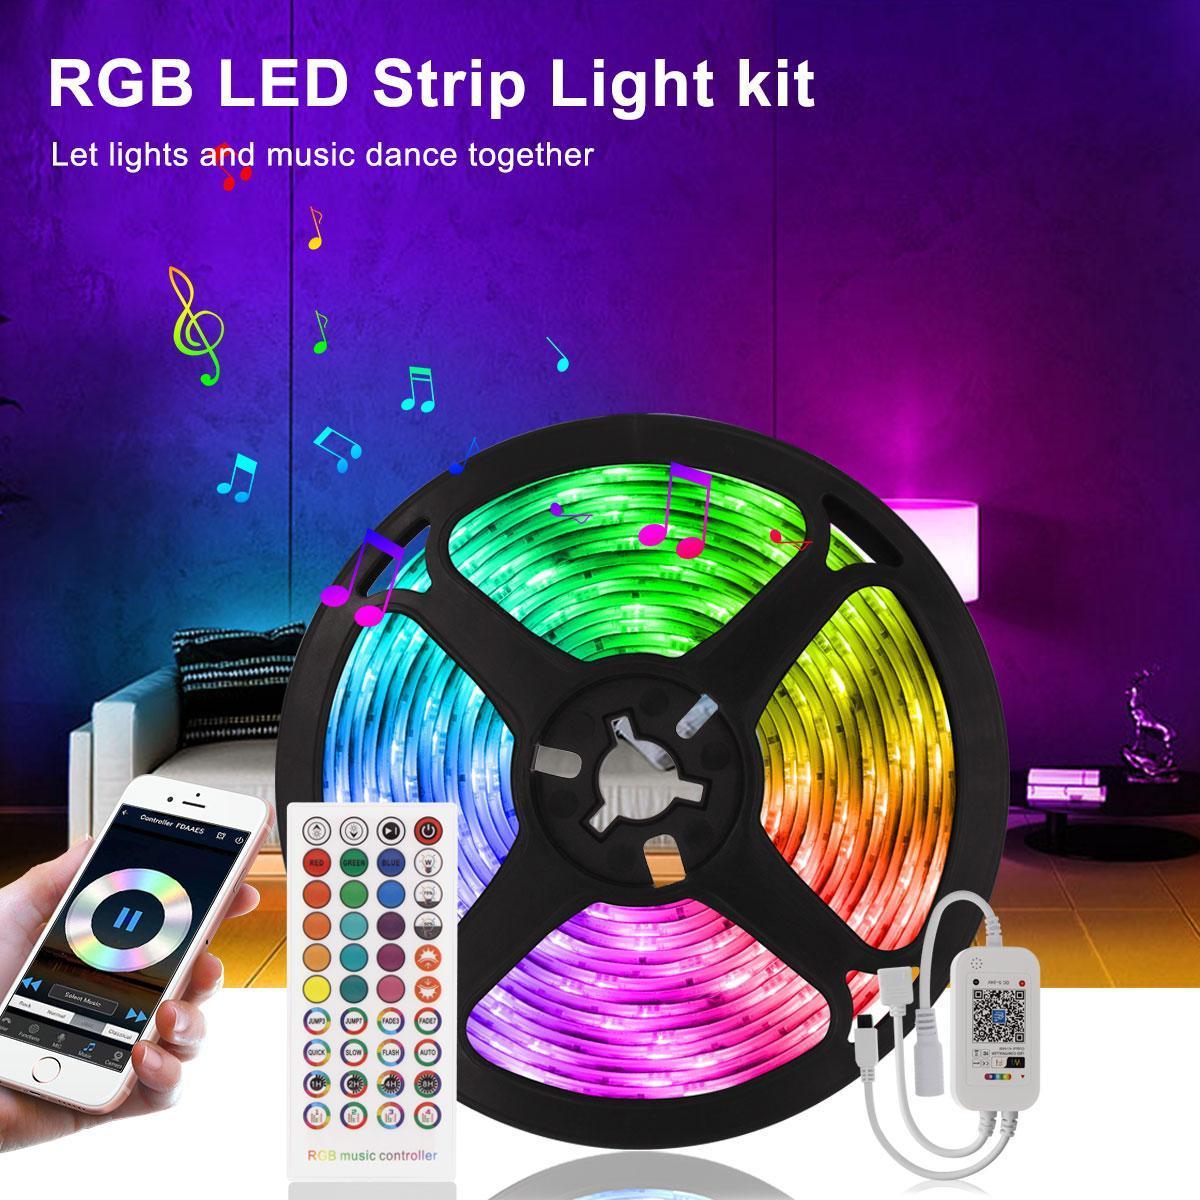 5m 10m LED-LED-Lichter Micomlan-Musik-Sync-Farbwechsel RGB-LED-Streifen eingebautes MIC-Bluetooth-App-gesteuert